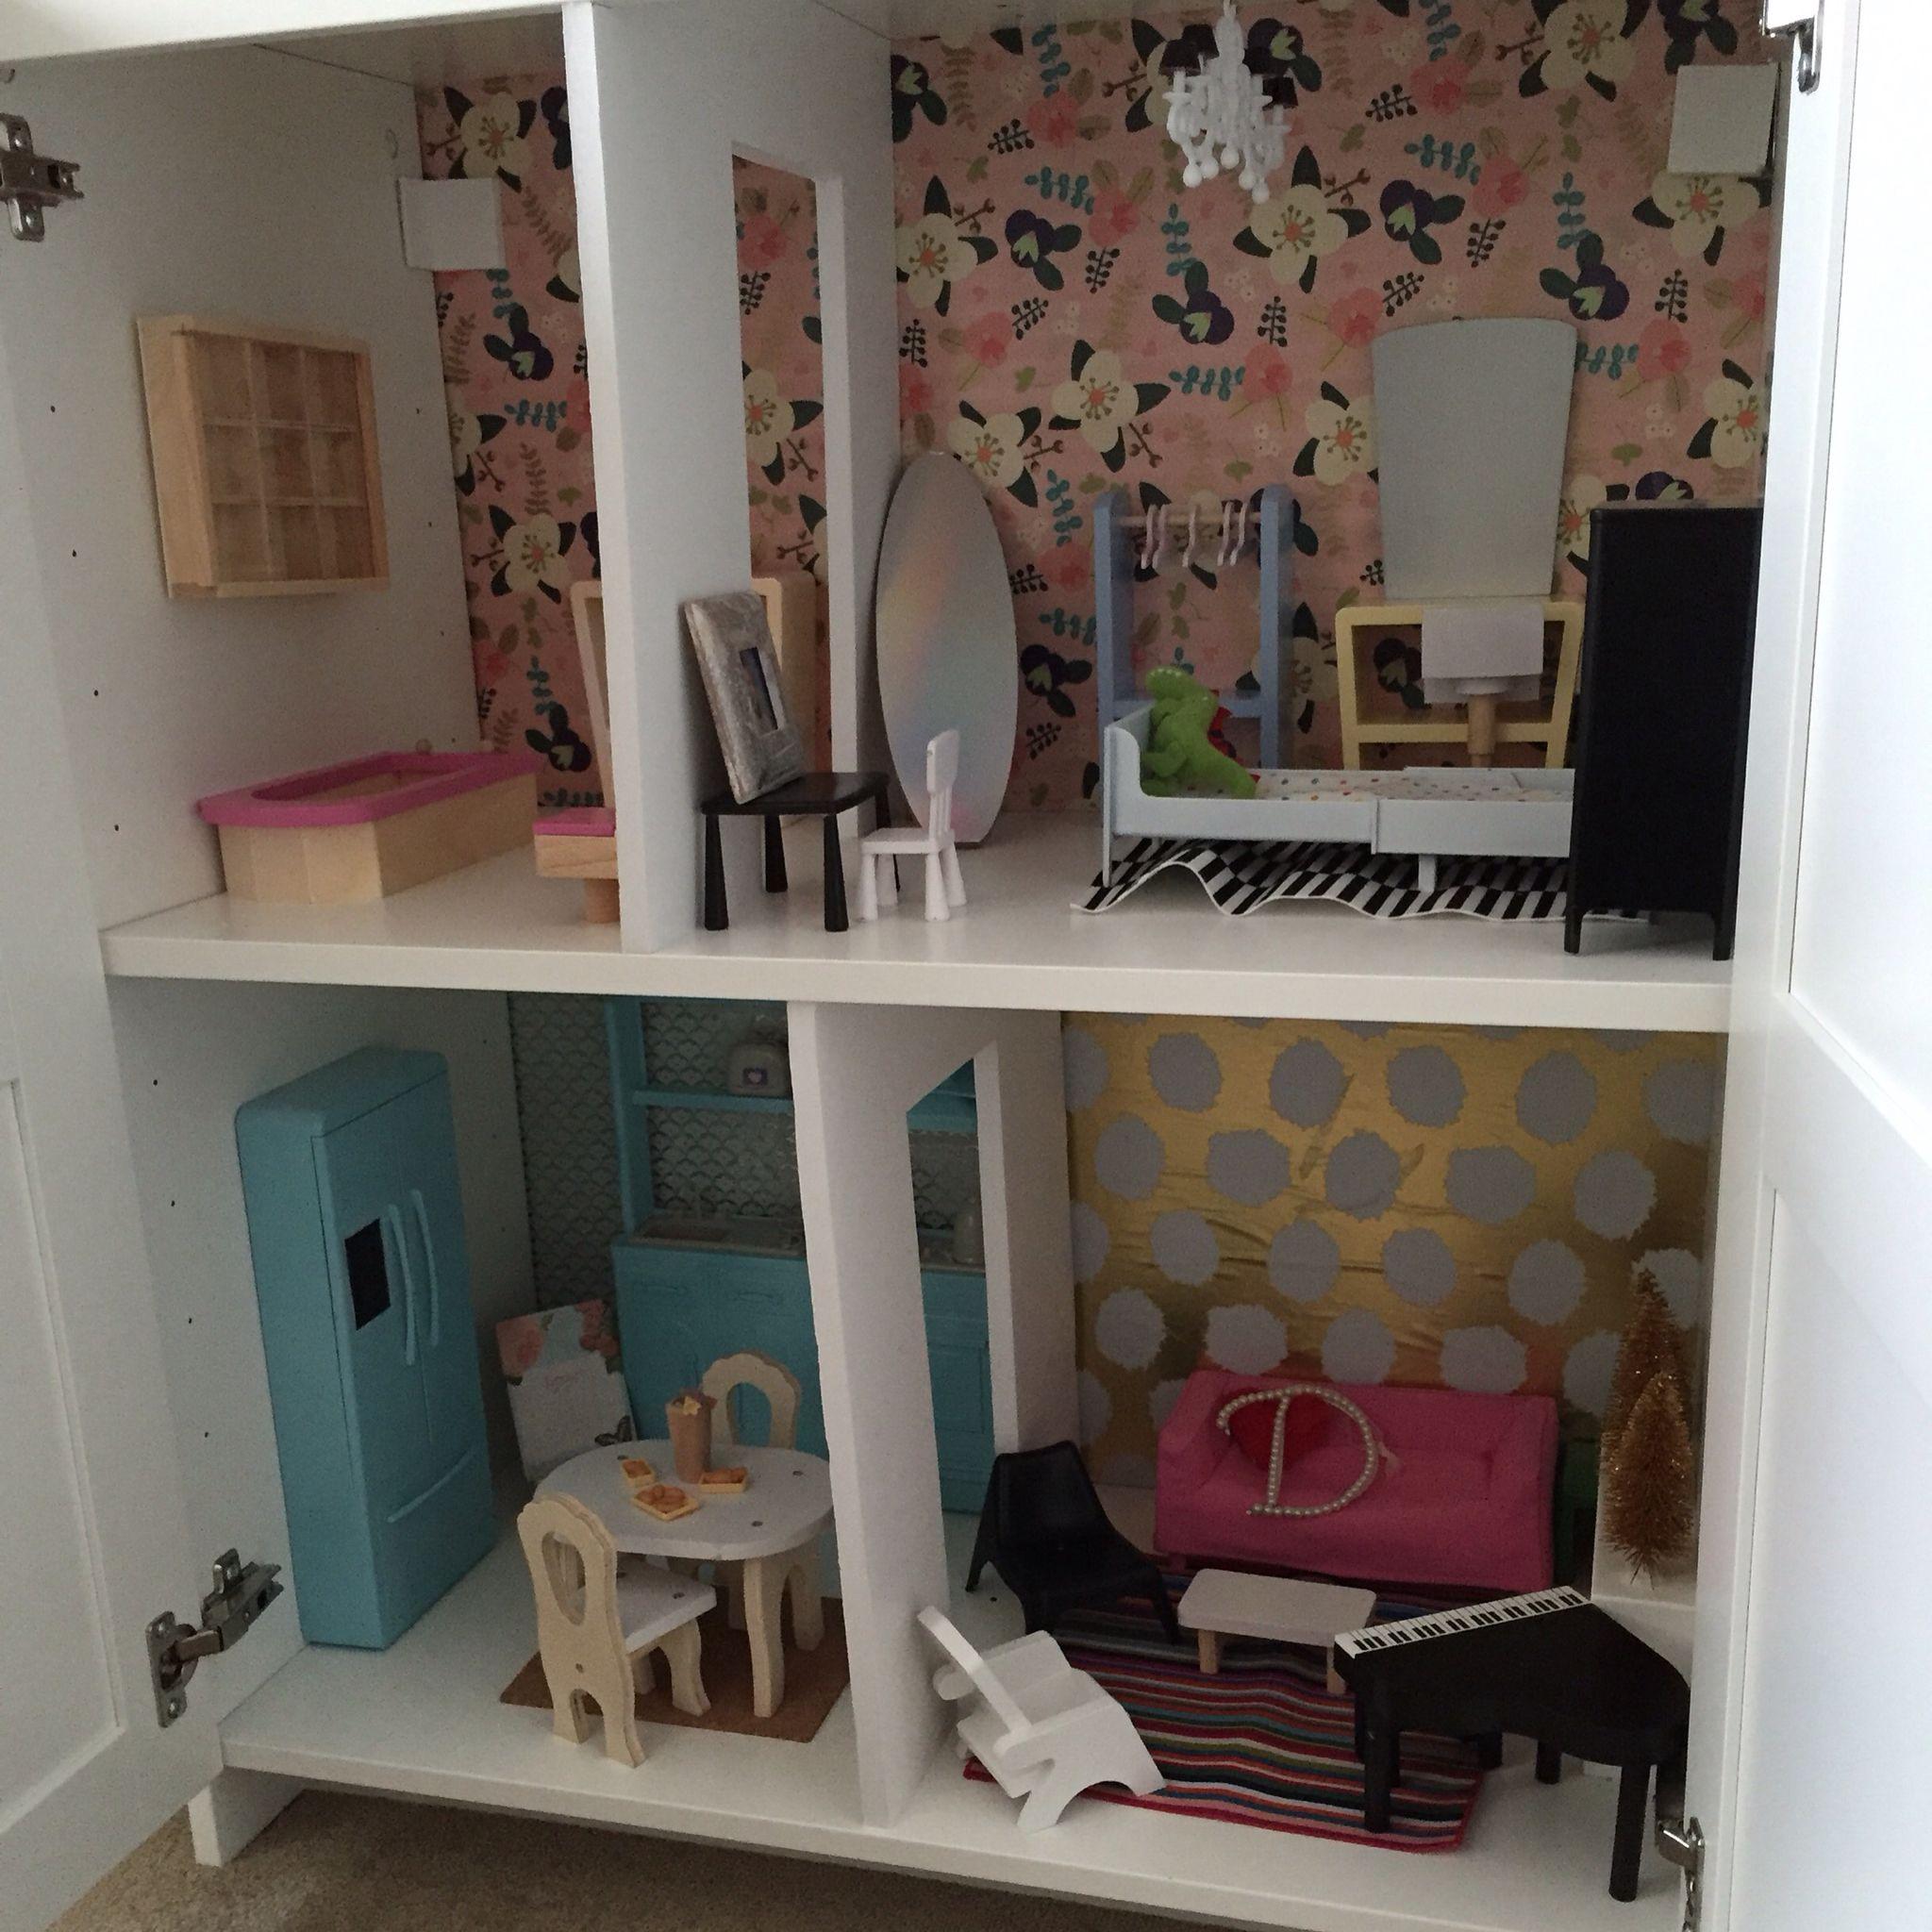 ikea dolls house furniture. Barbie House DIY- IKEA BRIMNES CABINET, Foam Board Dividers,IKEA Doll Furniture Ikea Dolls O